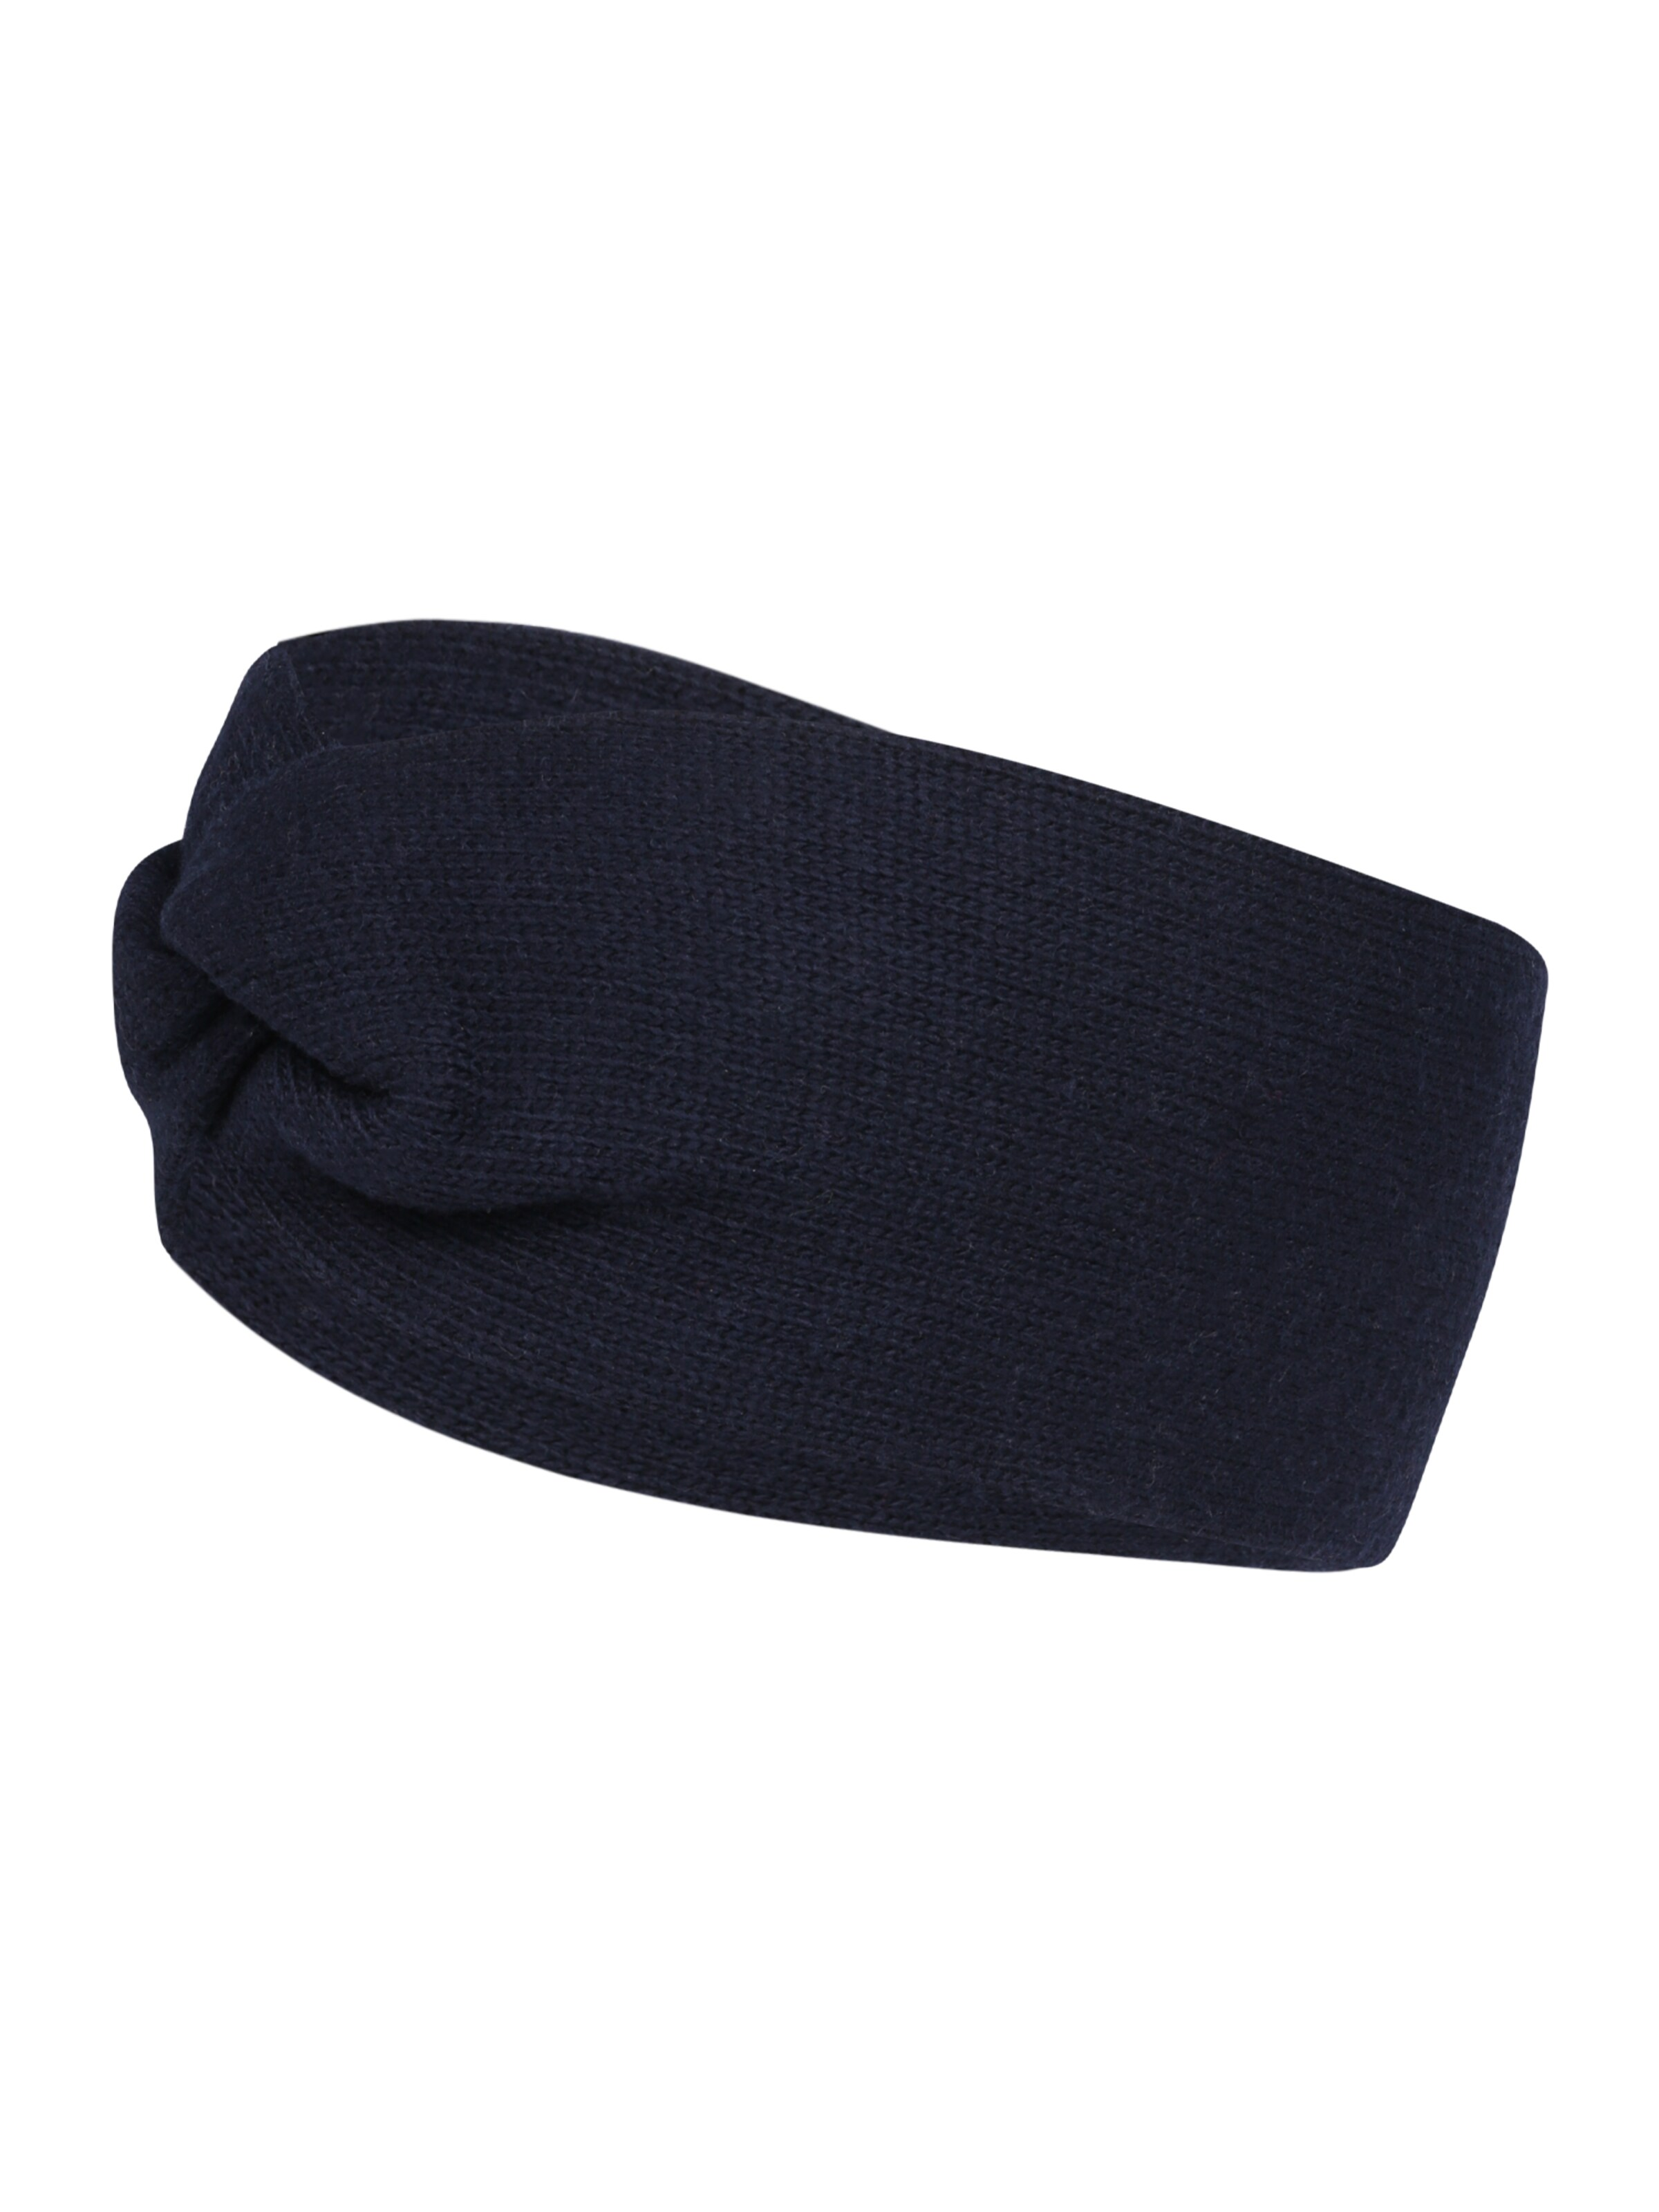 ROECKL Pannband i mörkblå